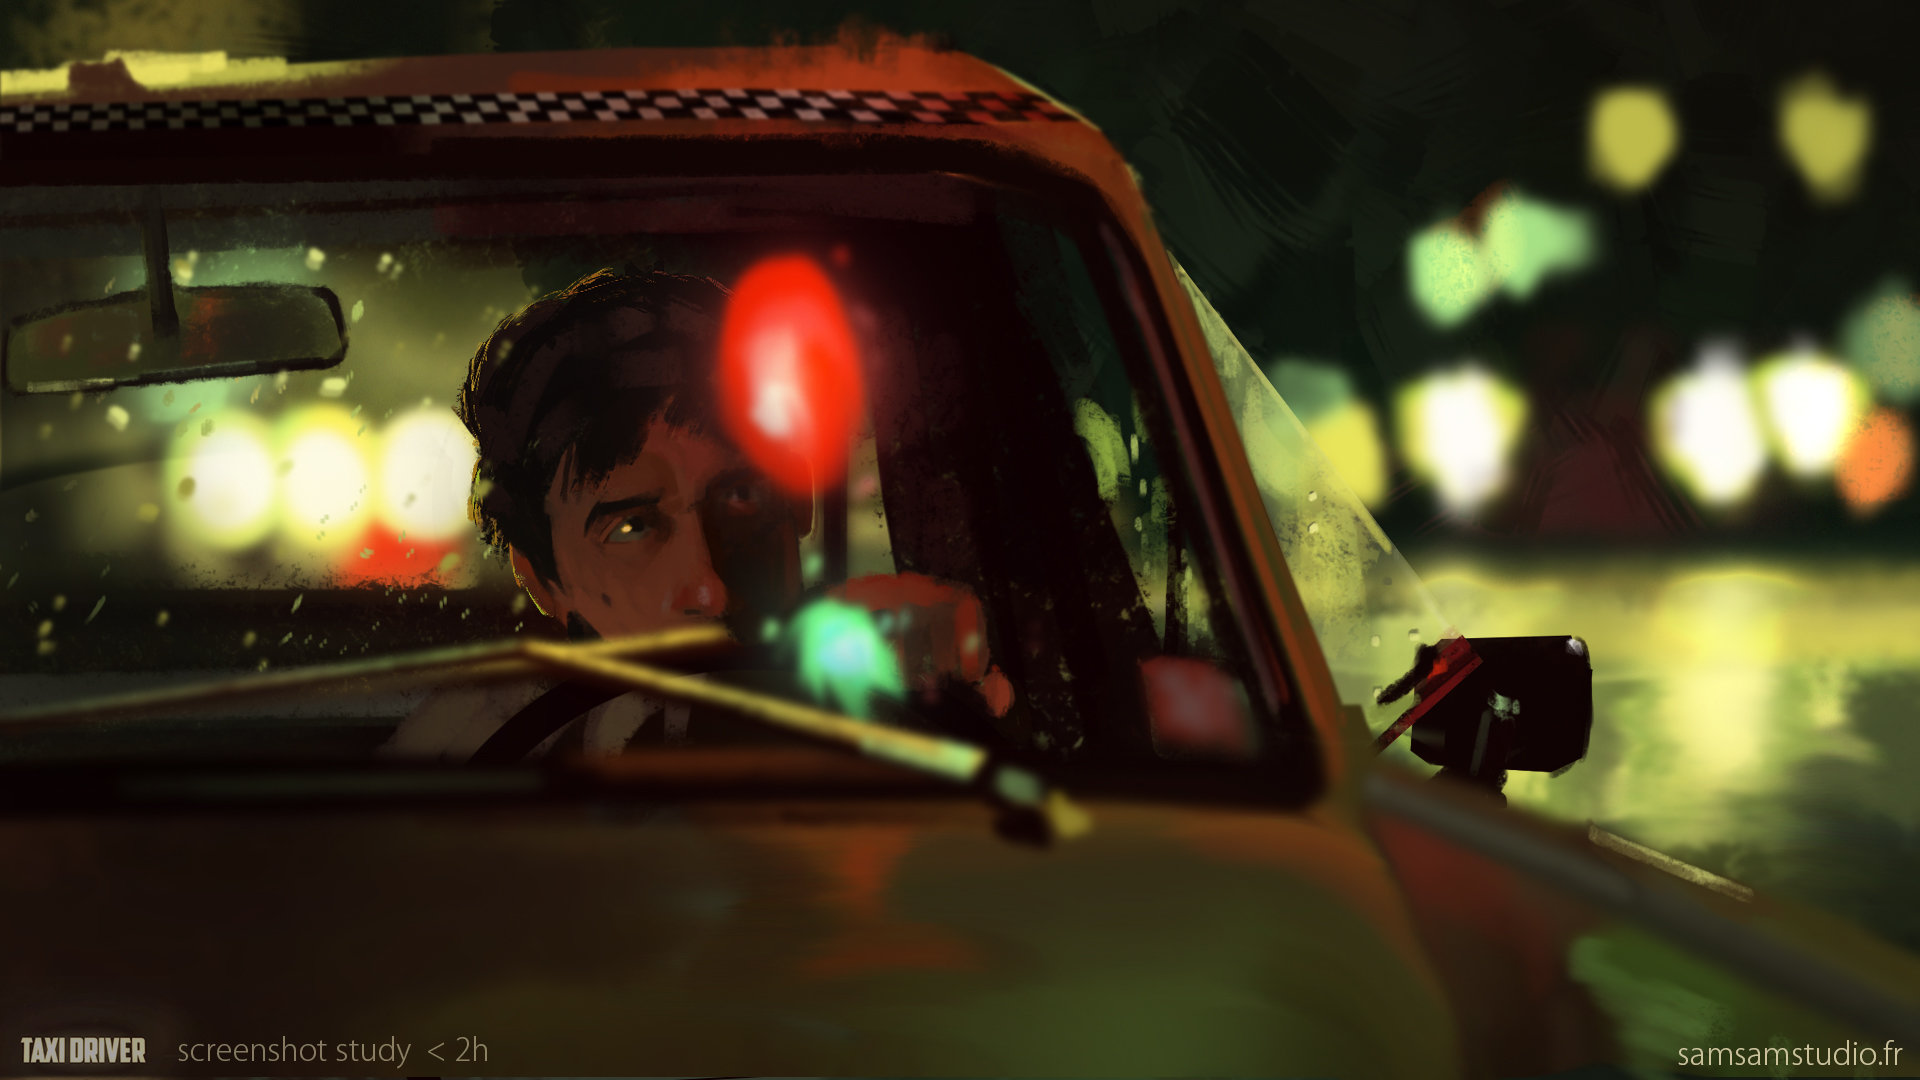 Sam smith taxi driver